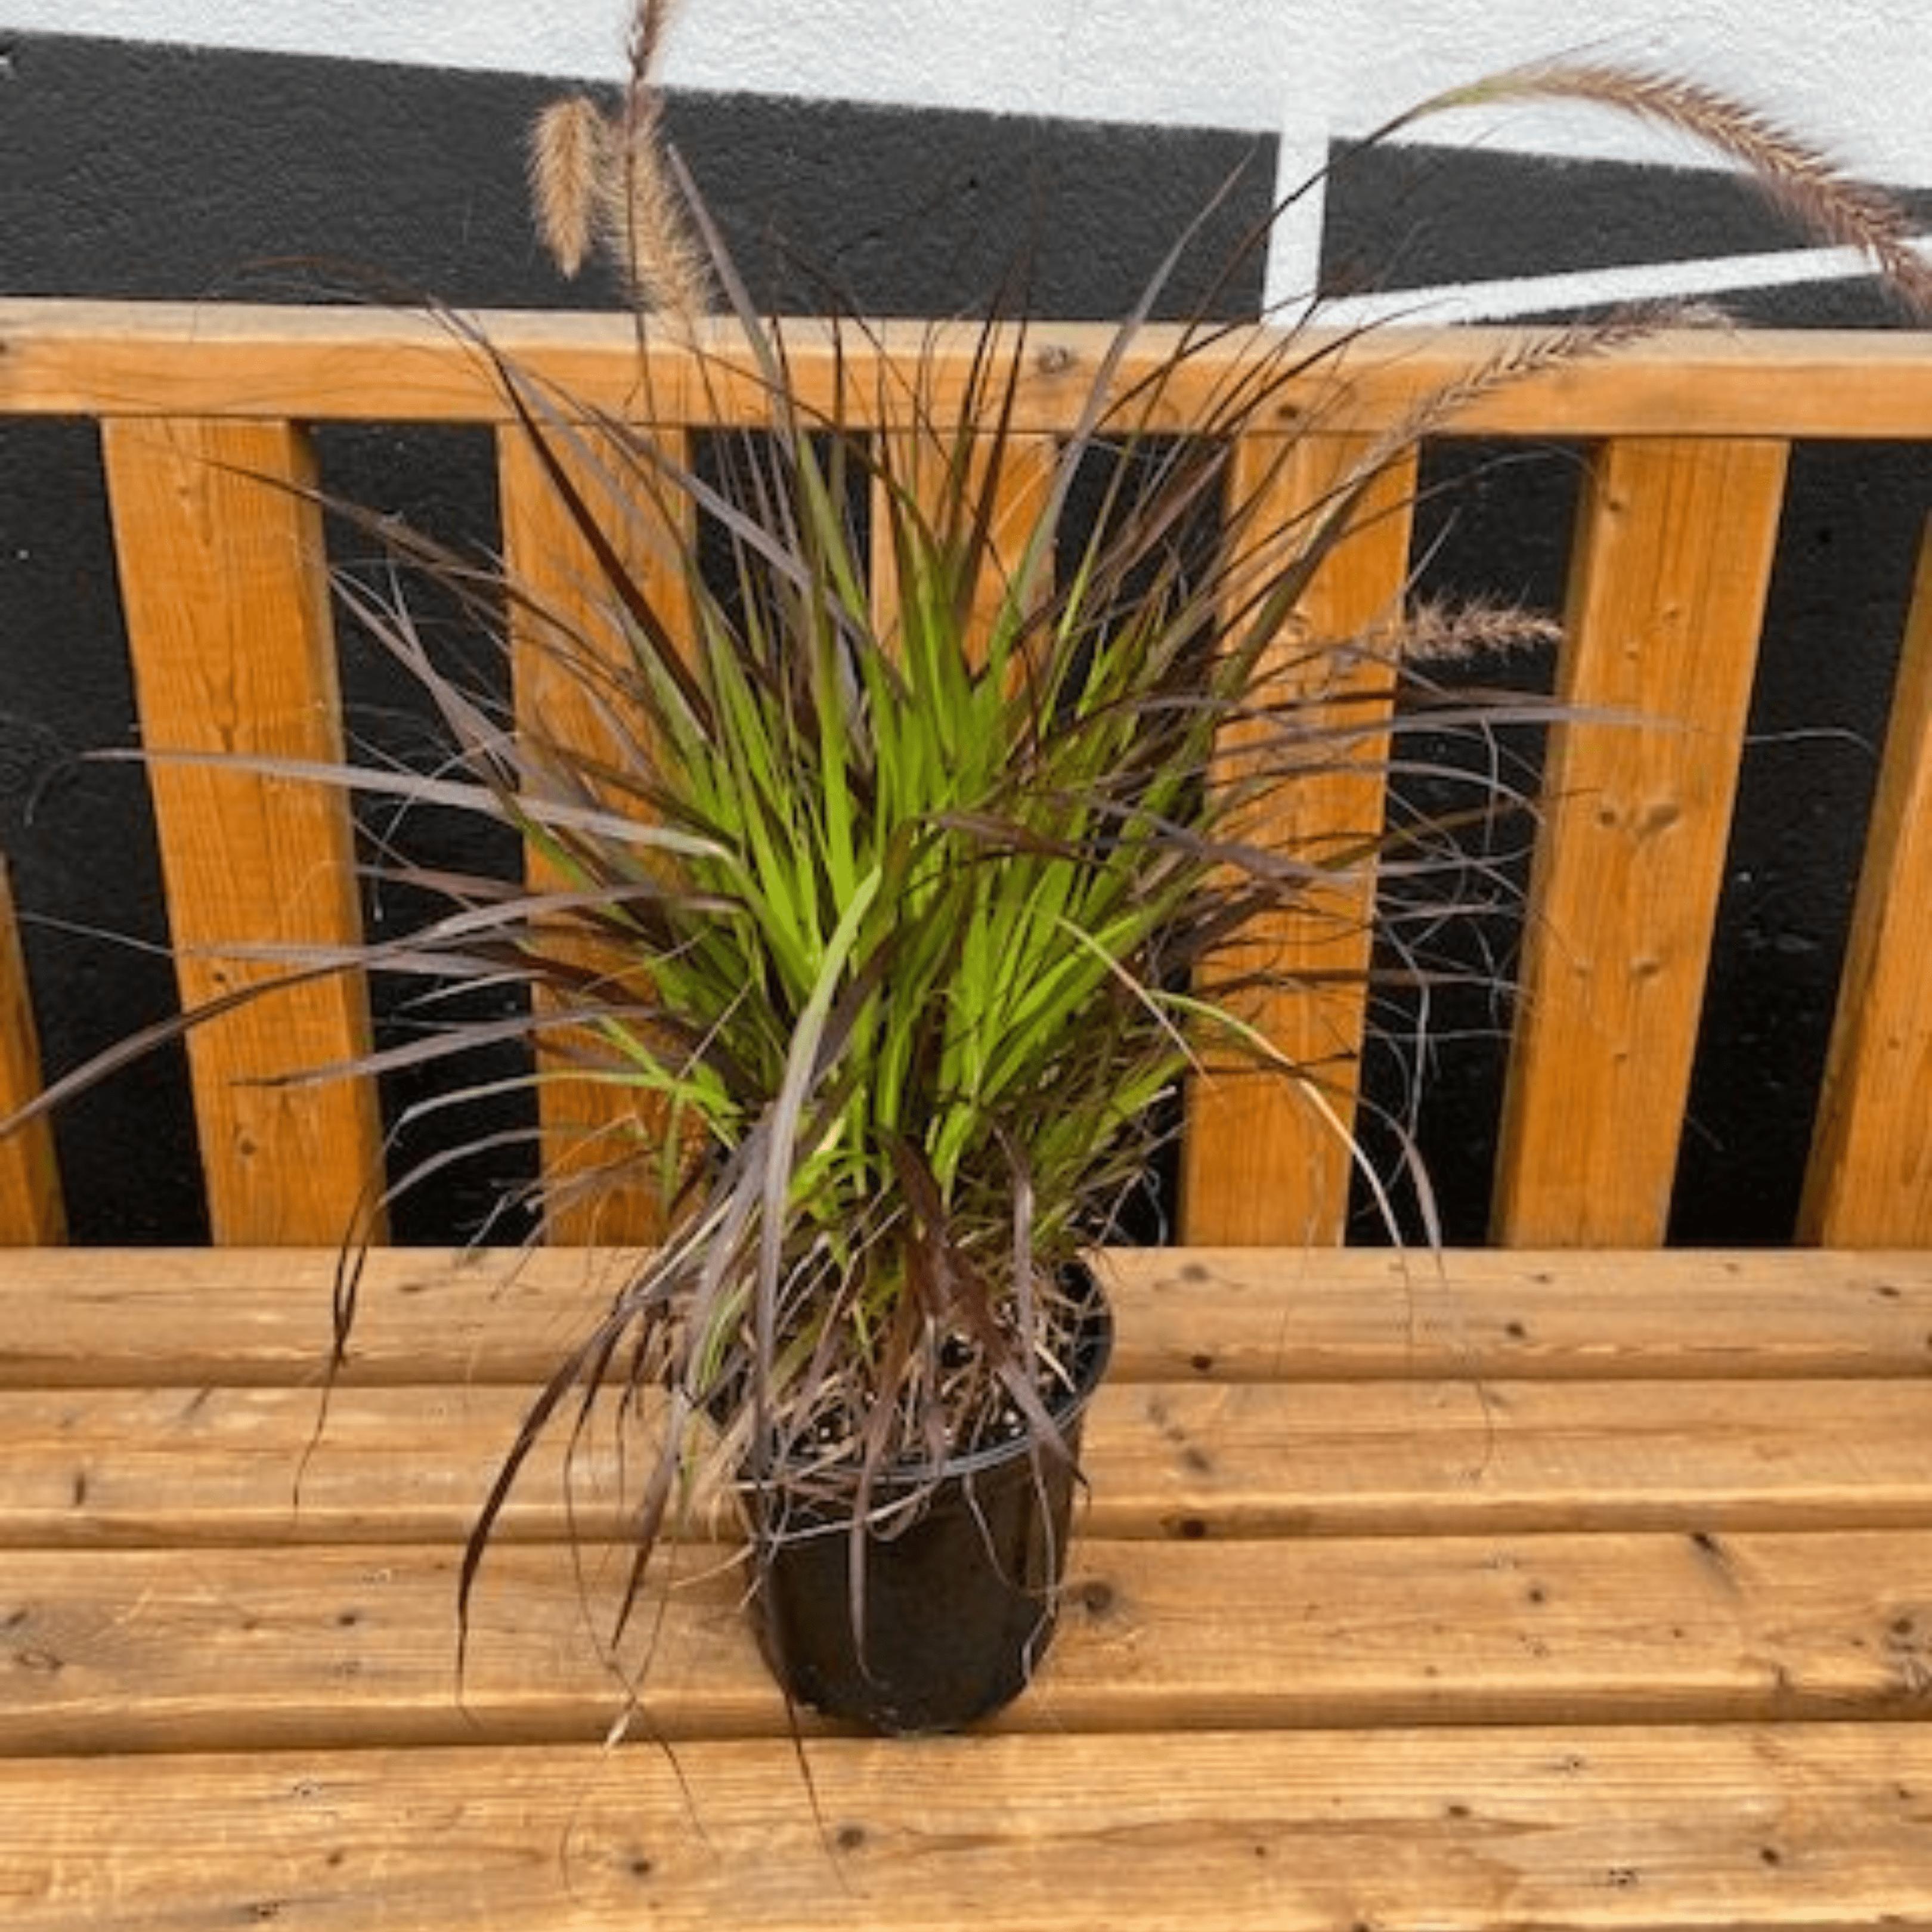 Falling For DIYs — Fall Planters, Workshops & More - Ornamental Grass